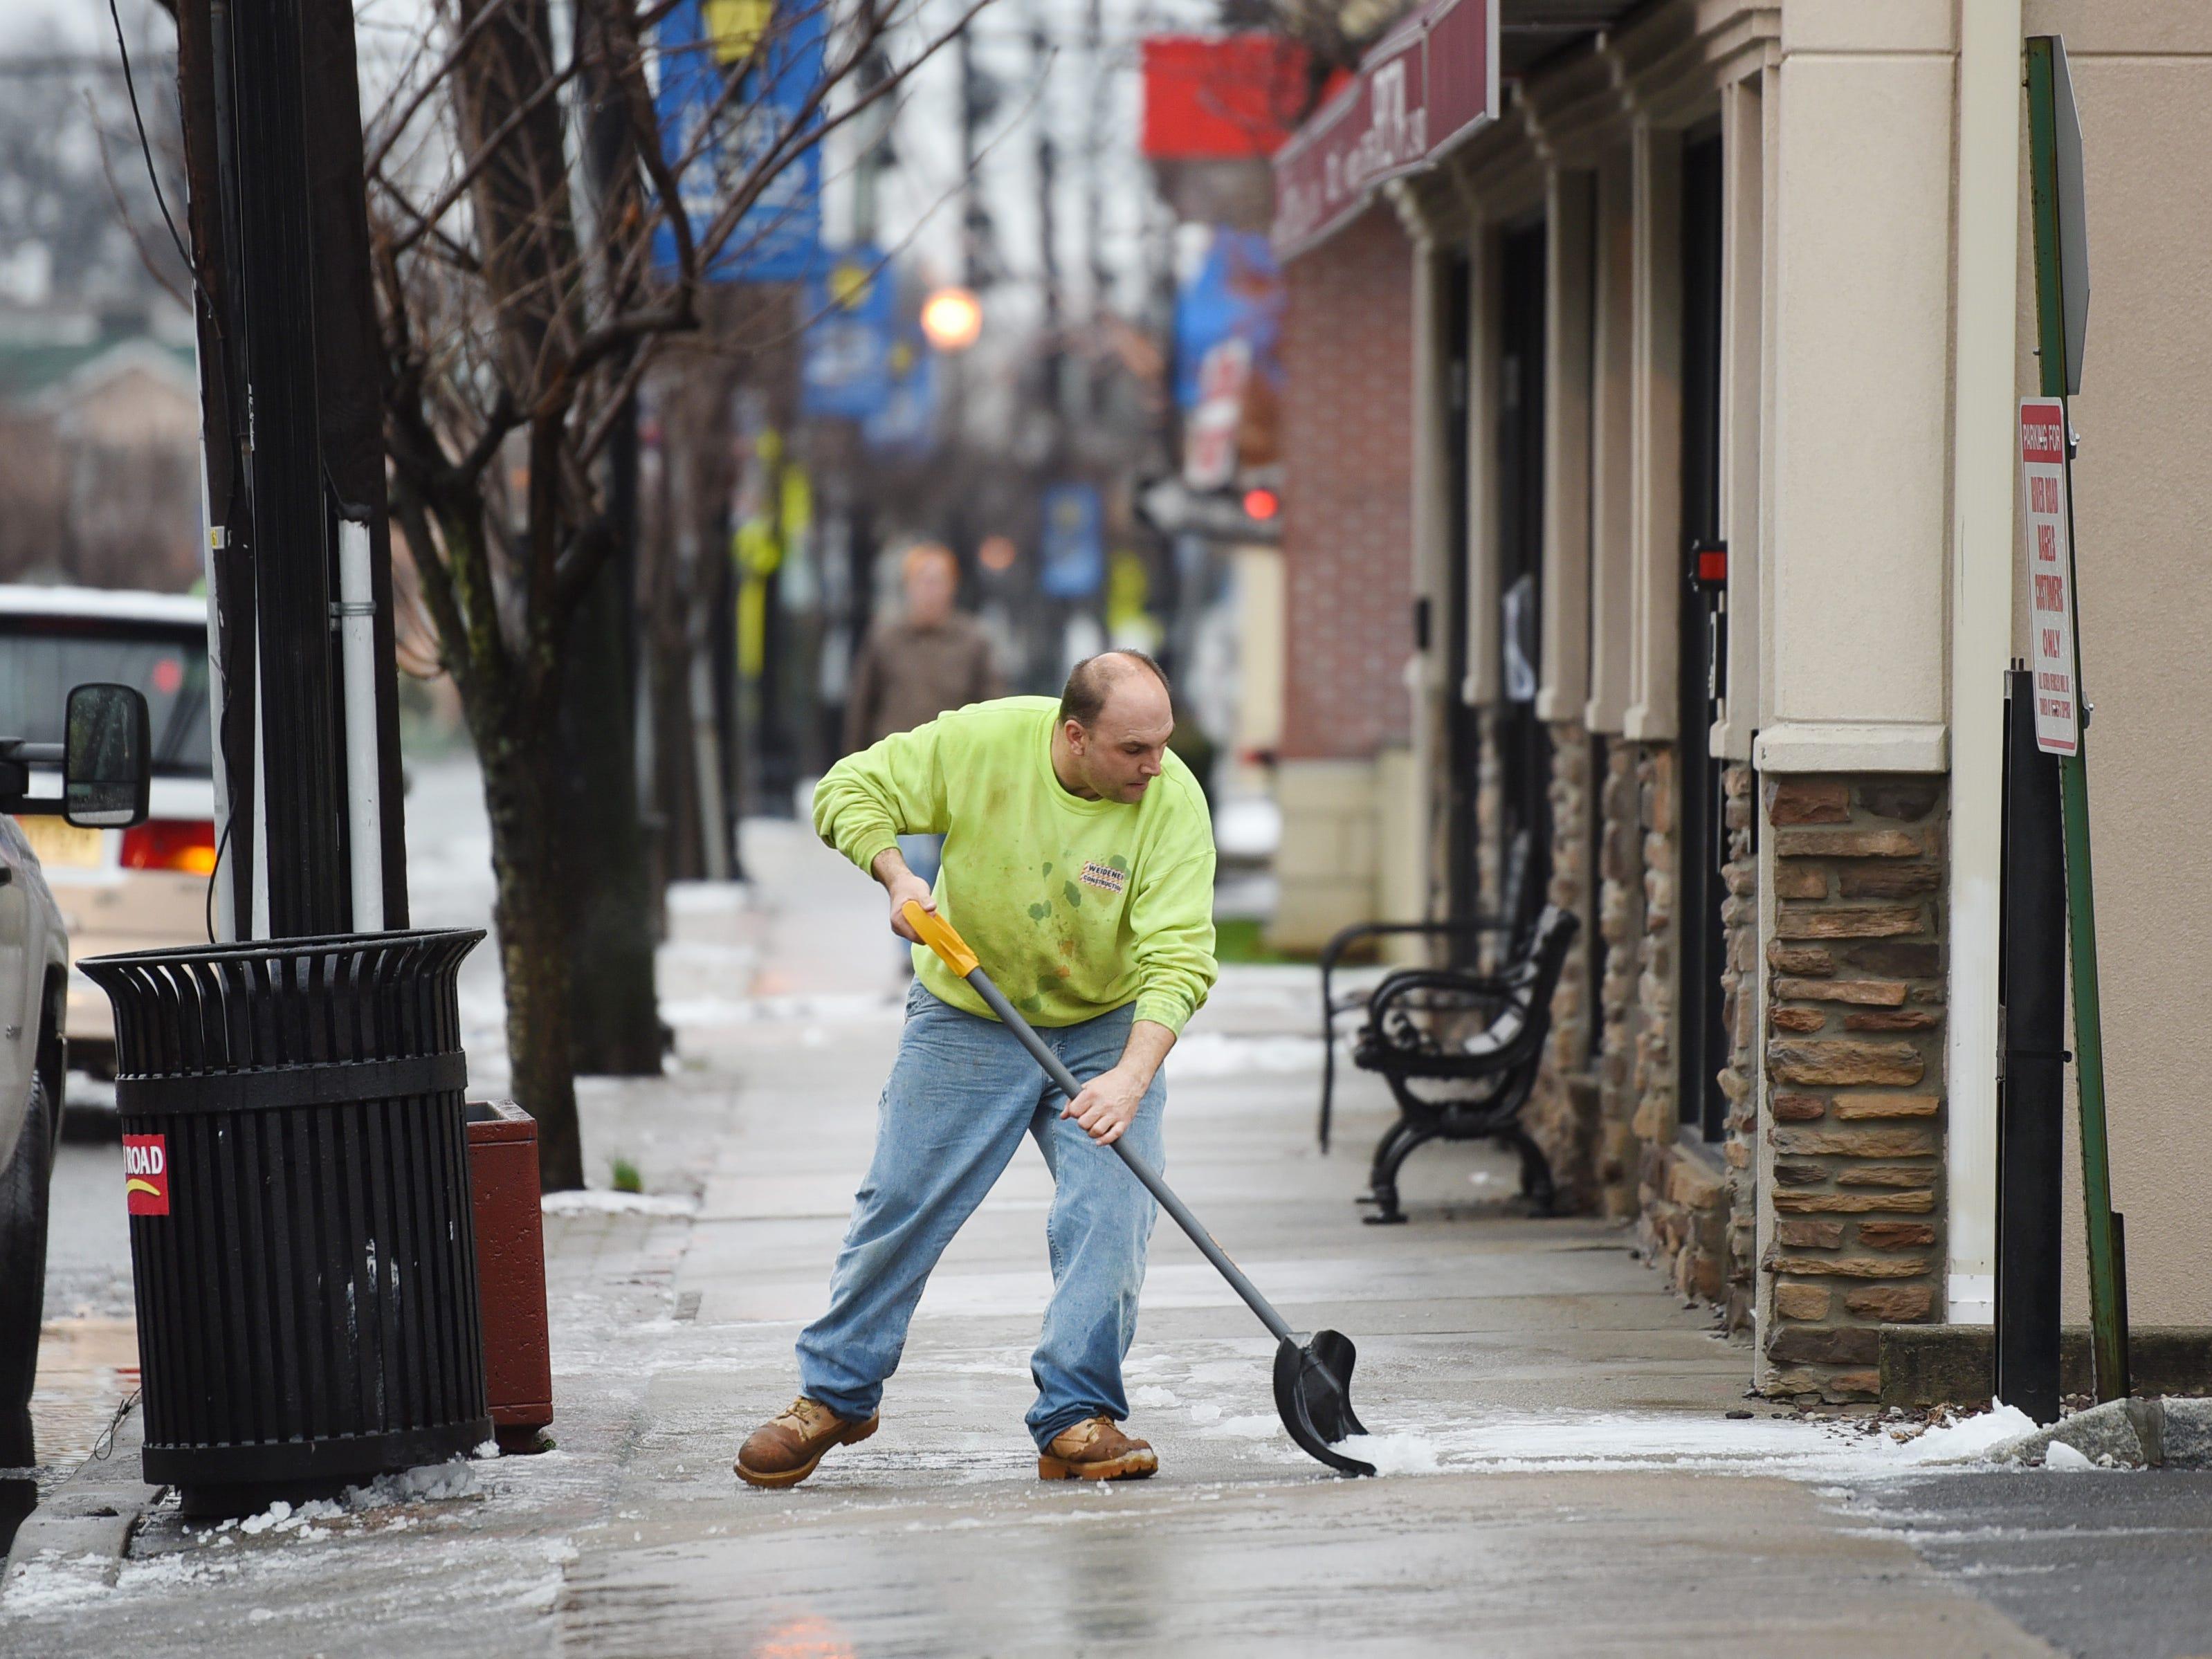 Robert Weidener removes slushy snow from the sidewalk along Fair Lawn Avenue on Sunday morning in Fair Lawn, NJ on 01/20/19.